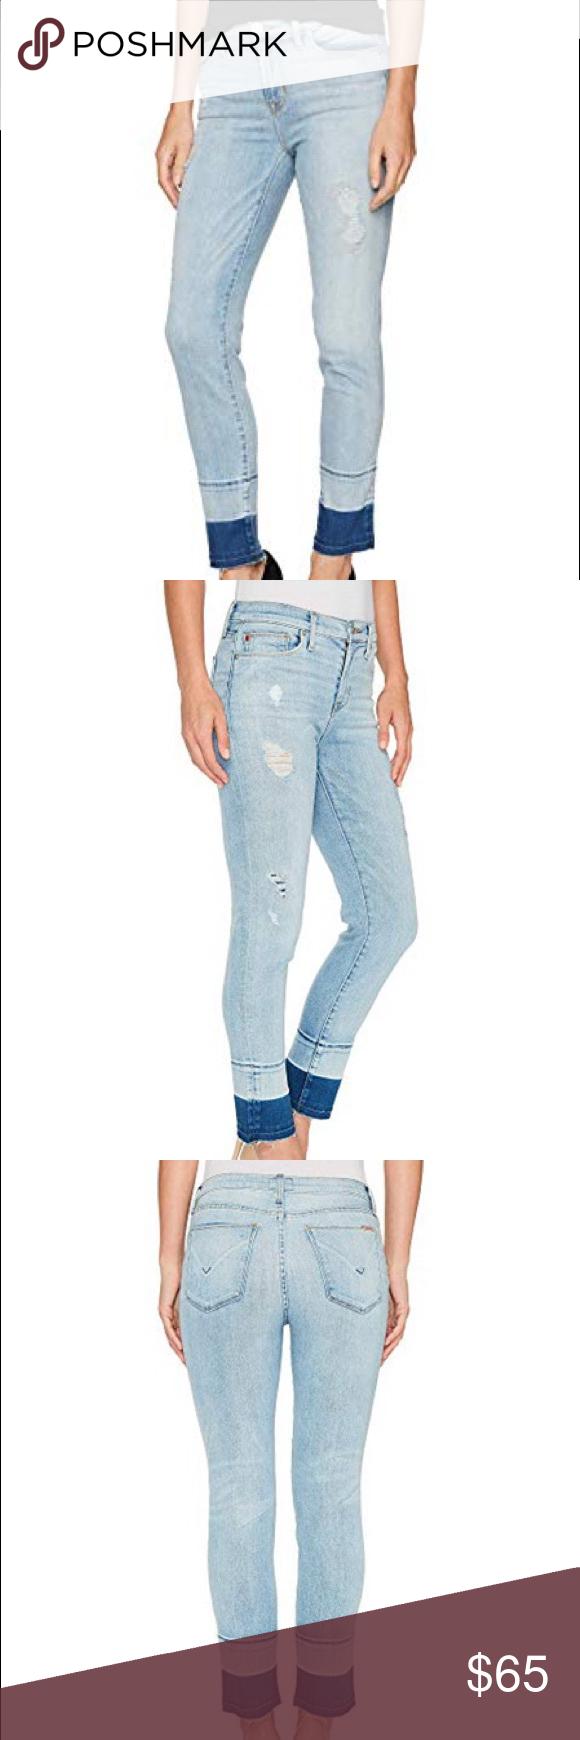 2227309becd NWT HUDSON Zooey Jeans Crop Straight Released Hem Classic HUDSON Zooey  Mid-Rise Crop Straight